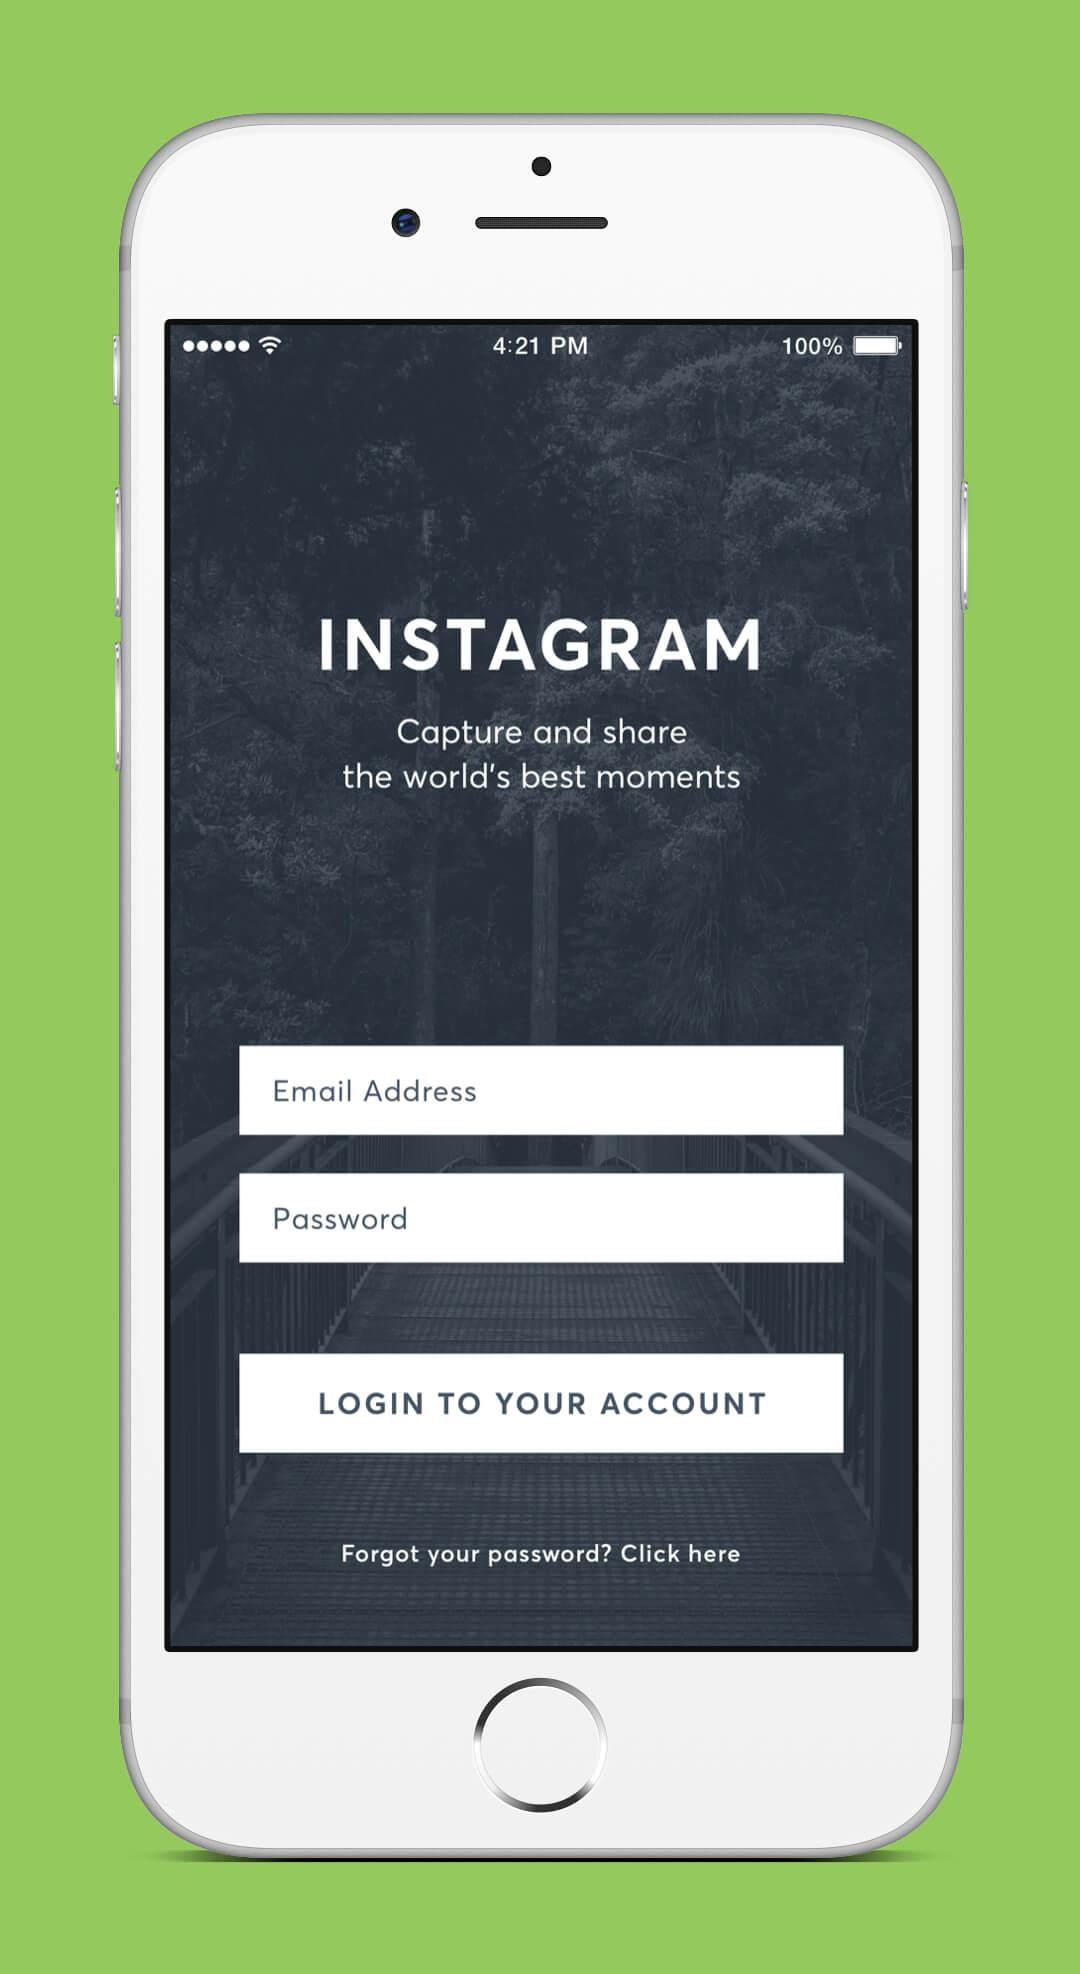 Instagram Redesign - Login Screen